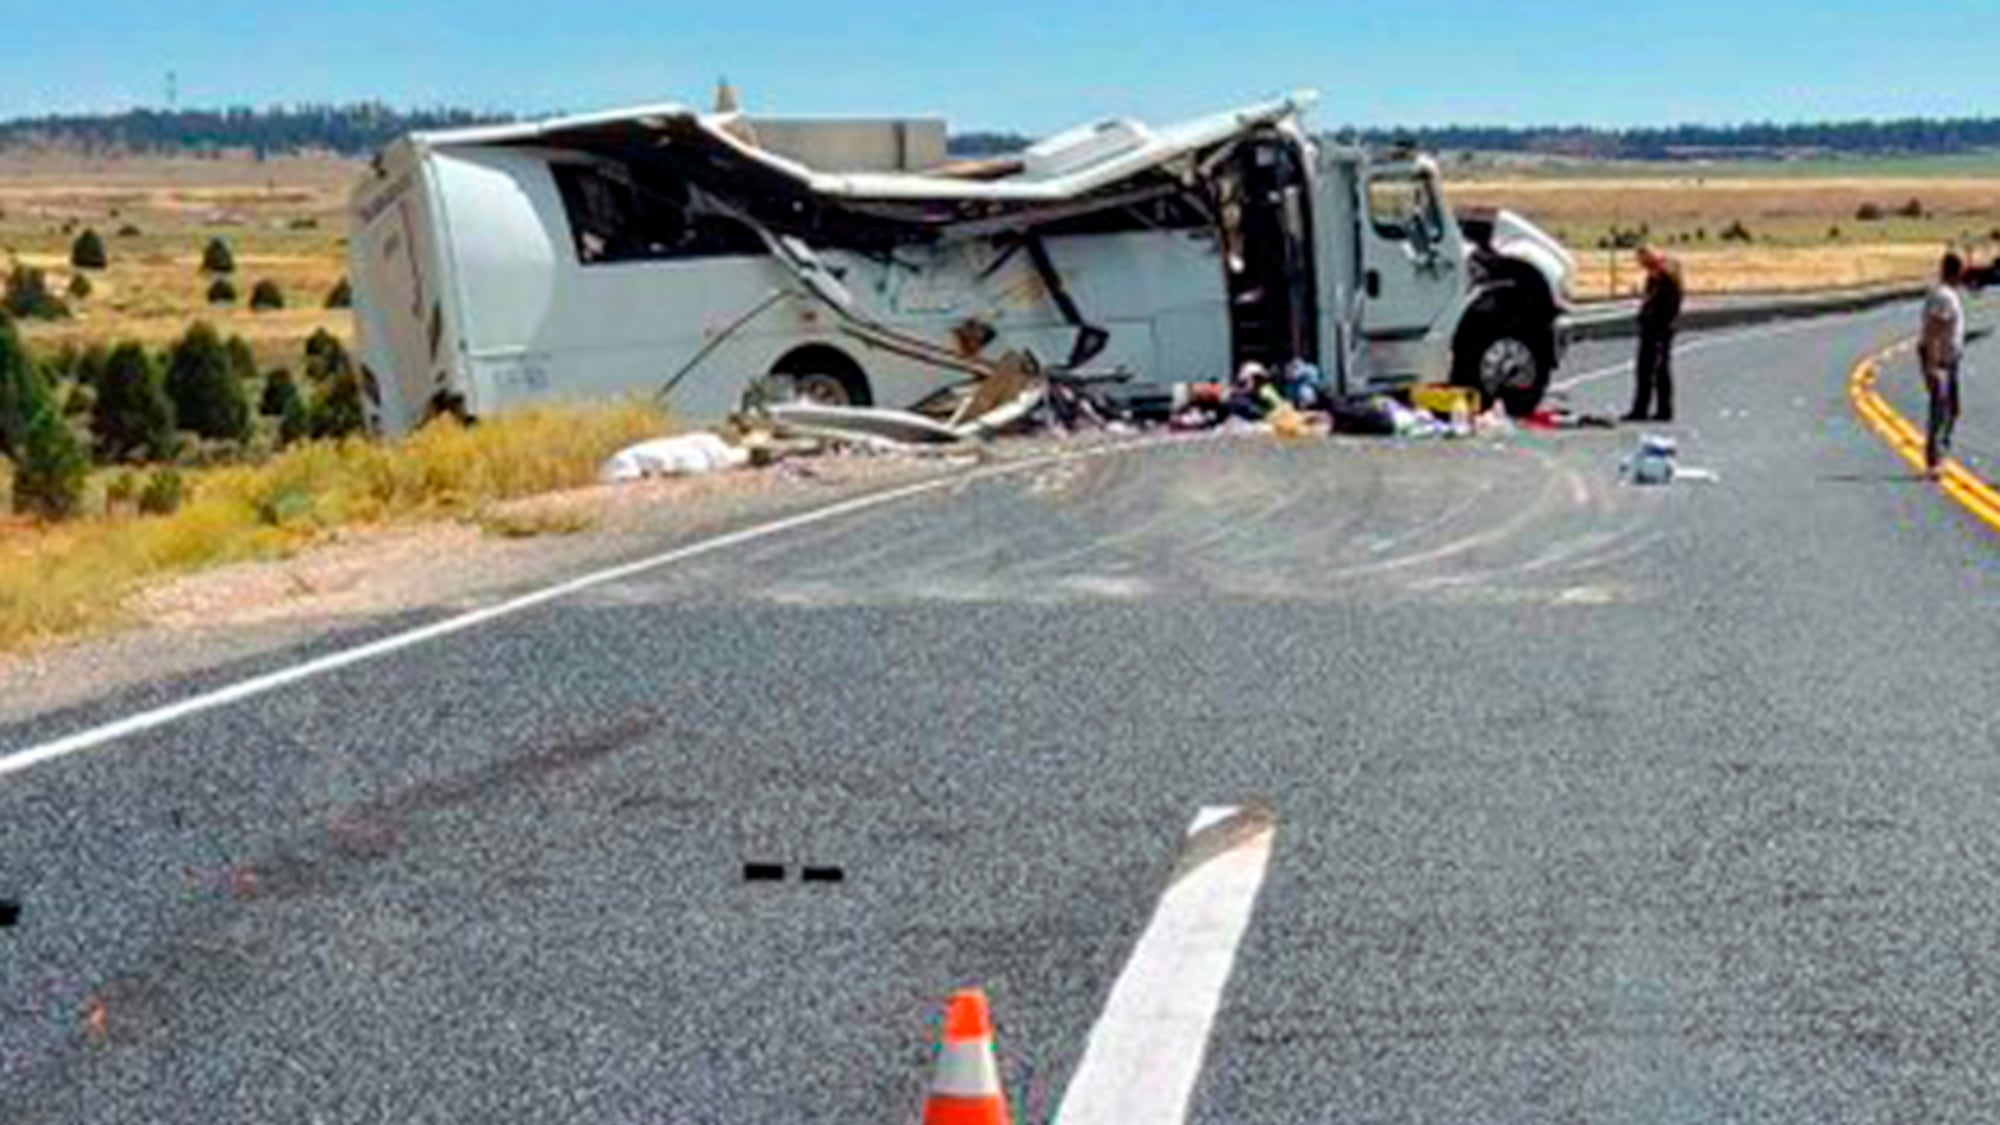 Tragödie beim Bryce Canyon: Vier Tote bei US-Busunglück in Utah